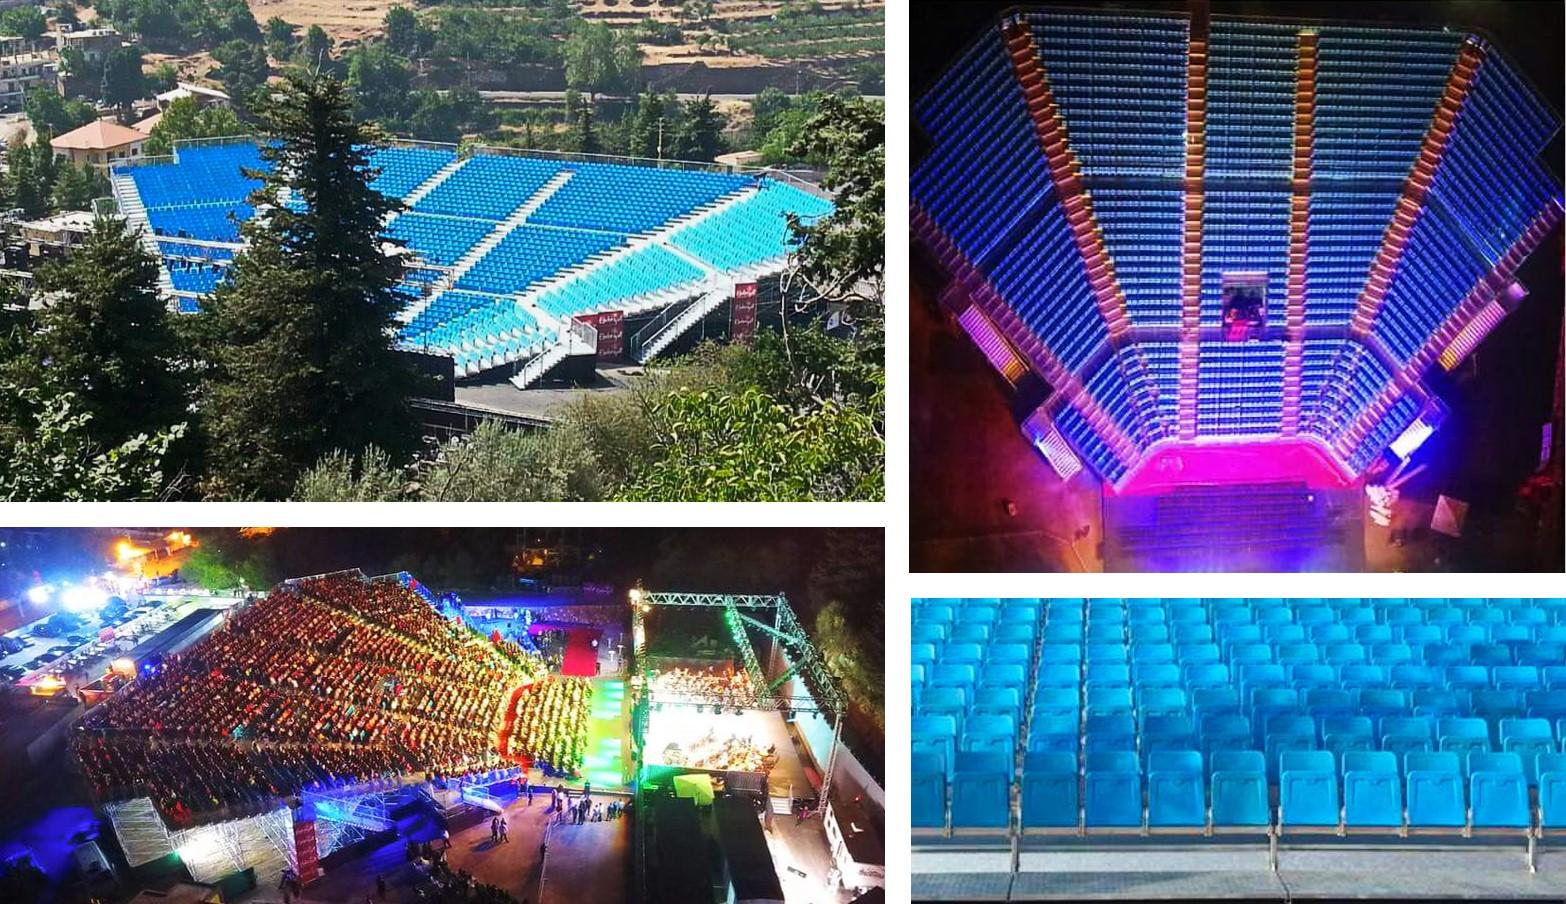 Lebanon Ehdeniyat Festival 2016 Pakar Seating Grandstand